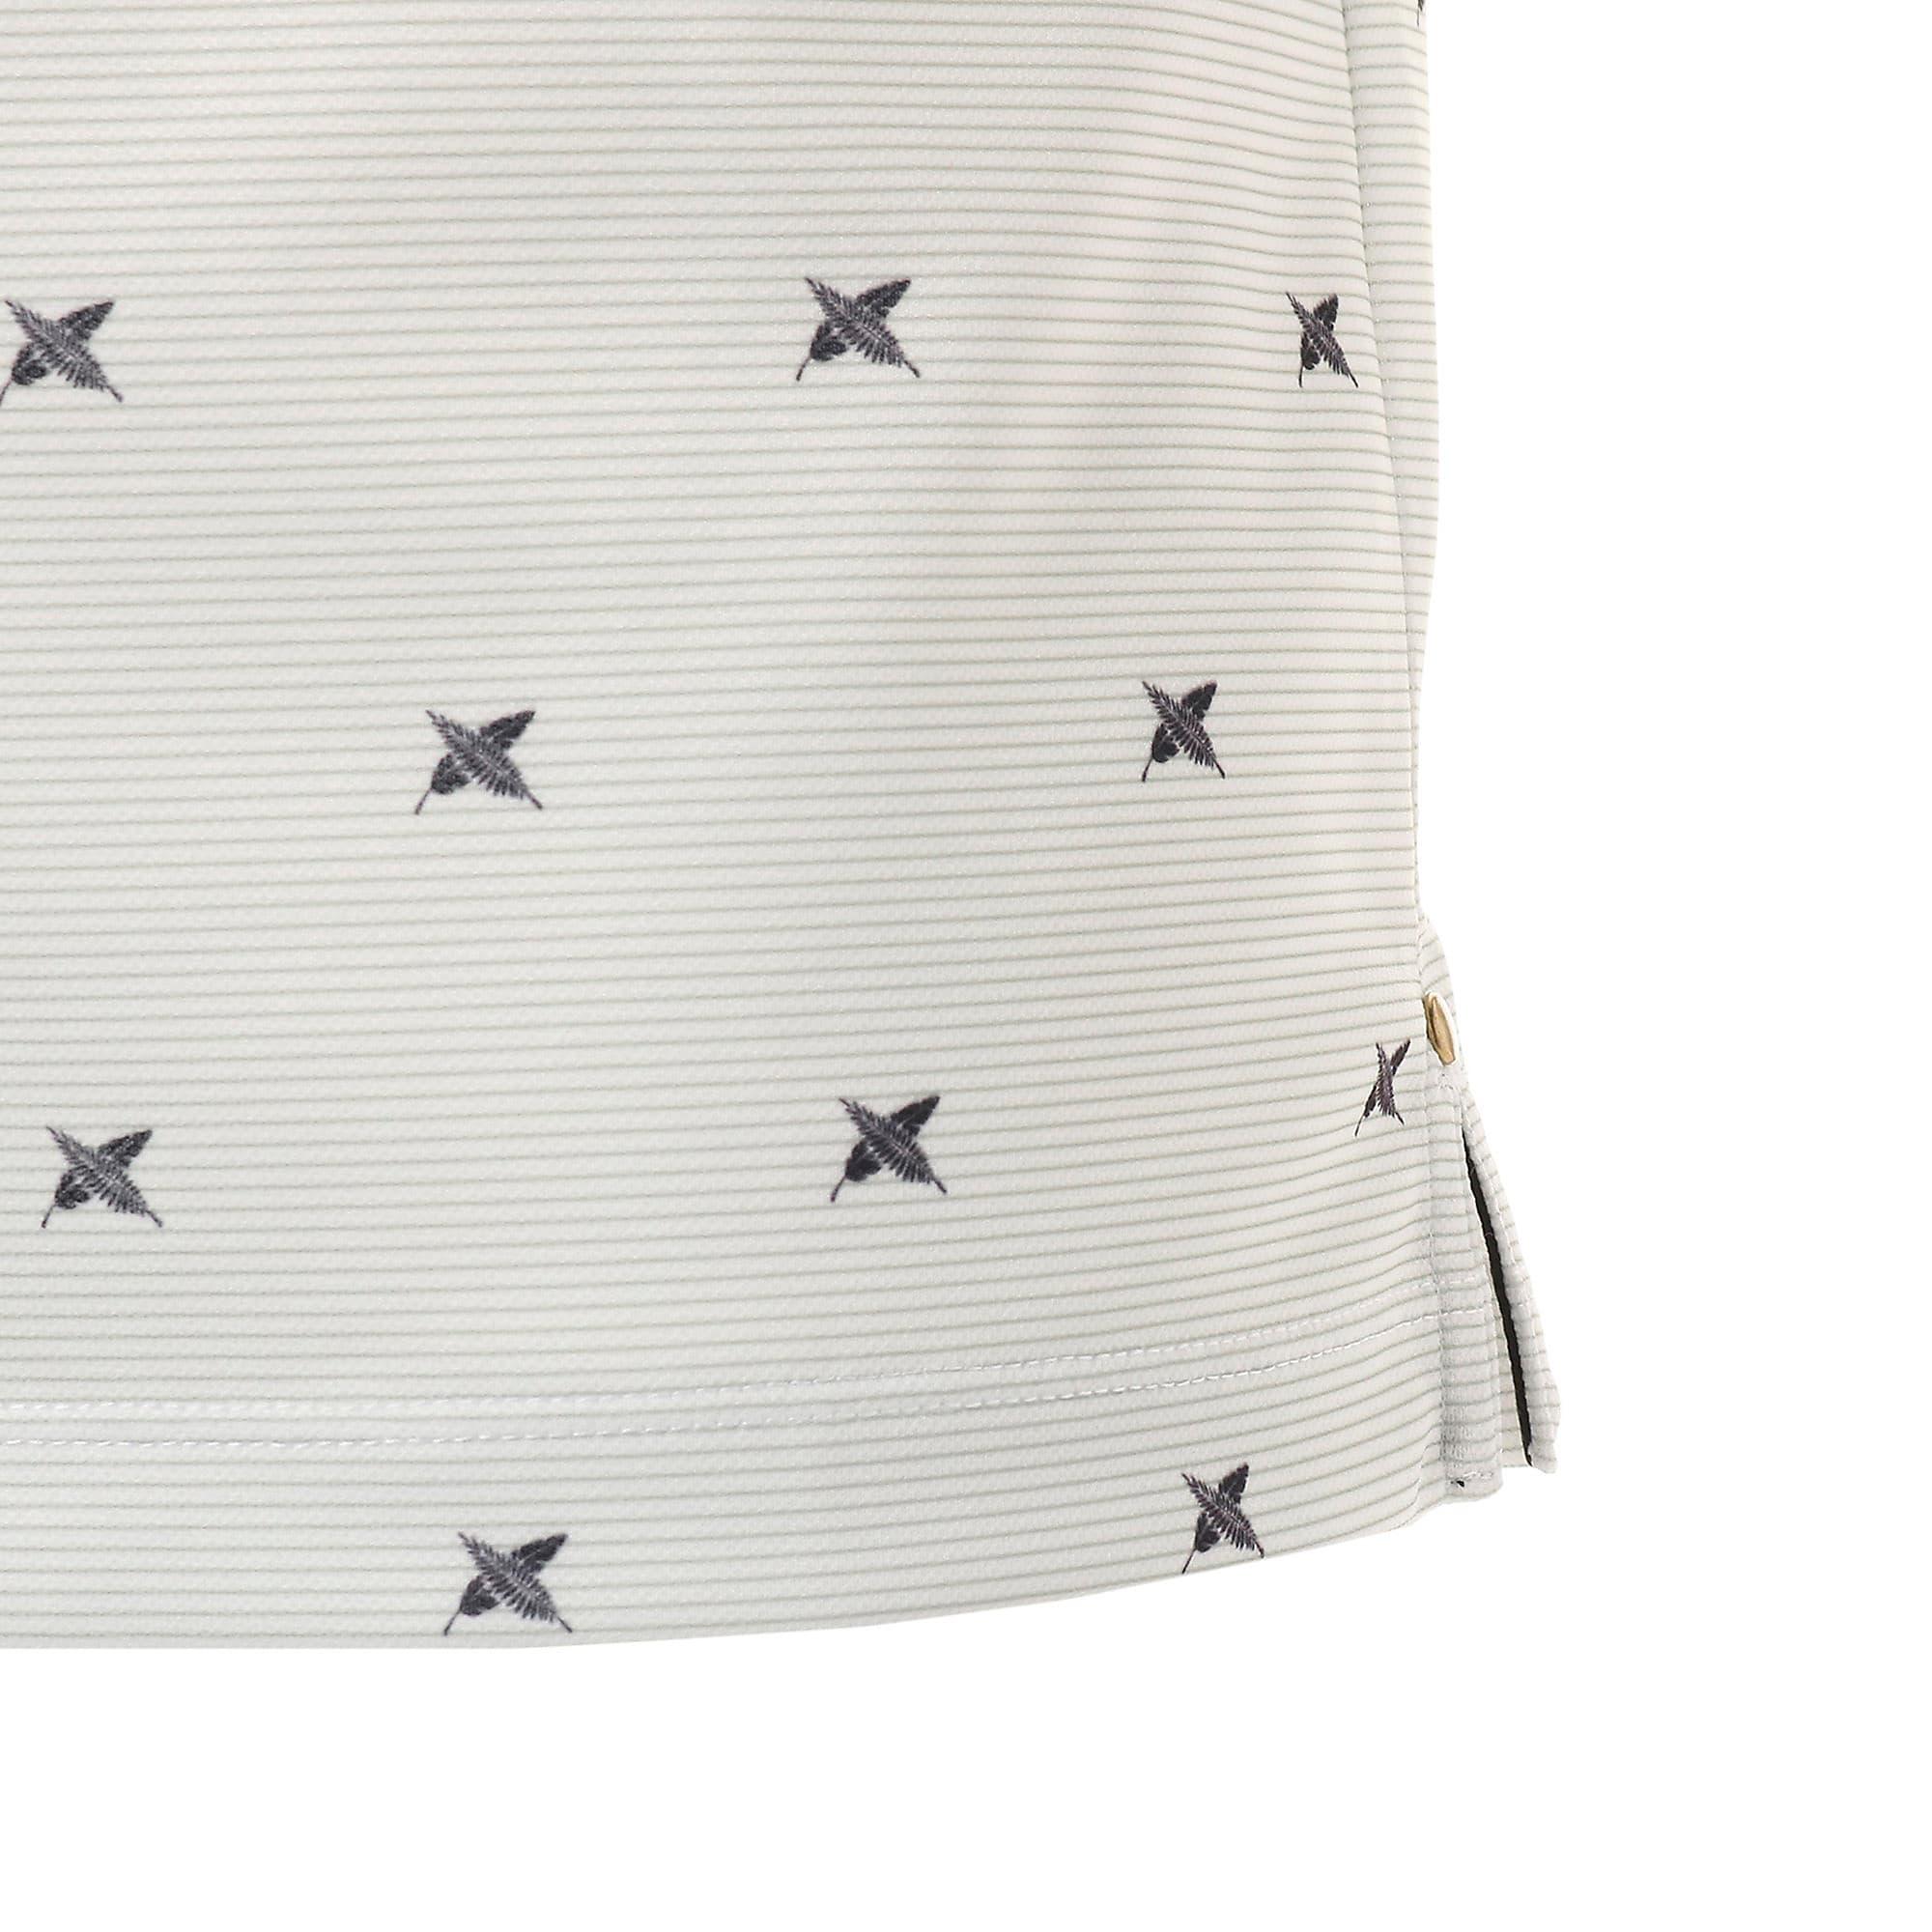 Thumbnail 6 of ゴルフ フェザーフュージョン SSポロシャツ 半袖, Bright White, medium-JPN